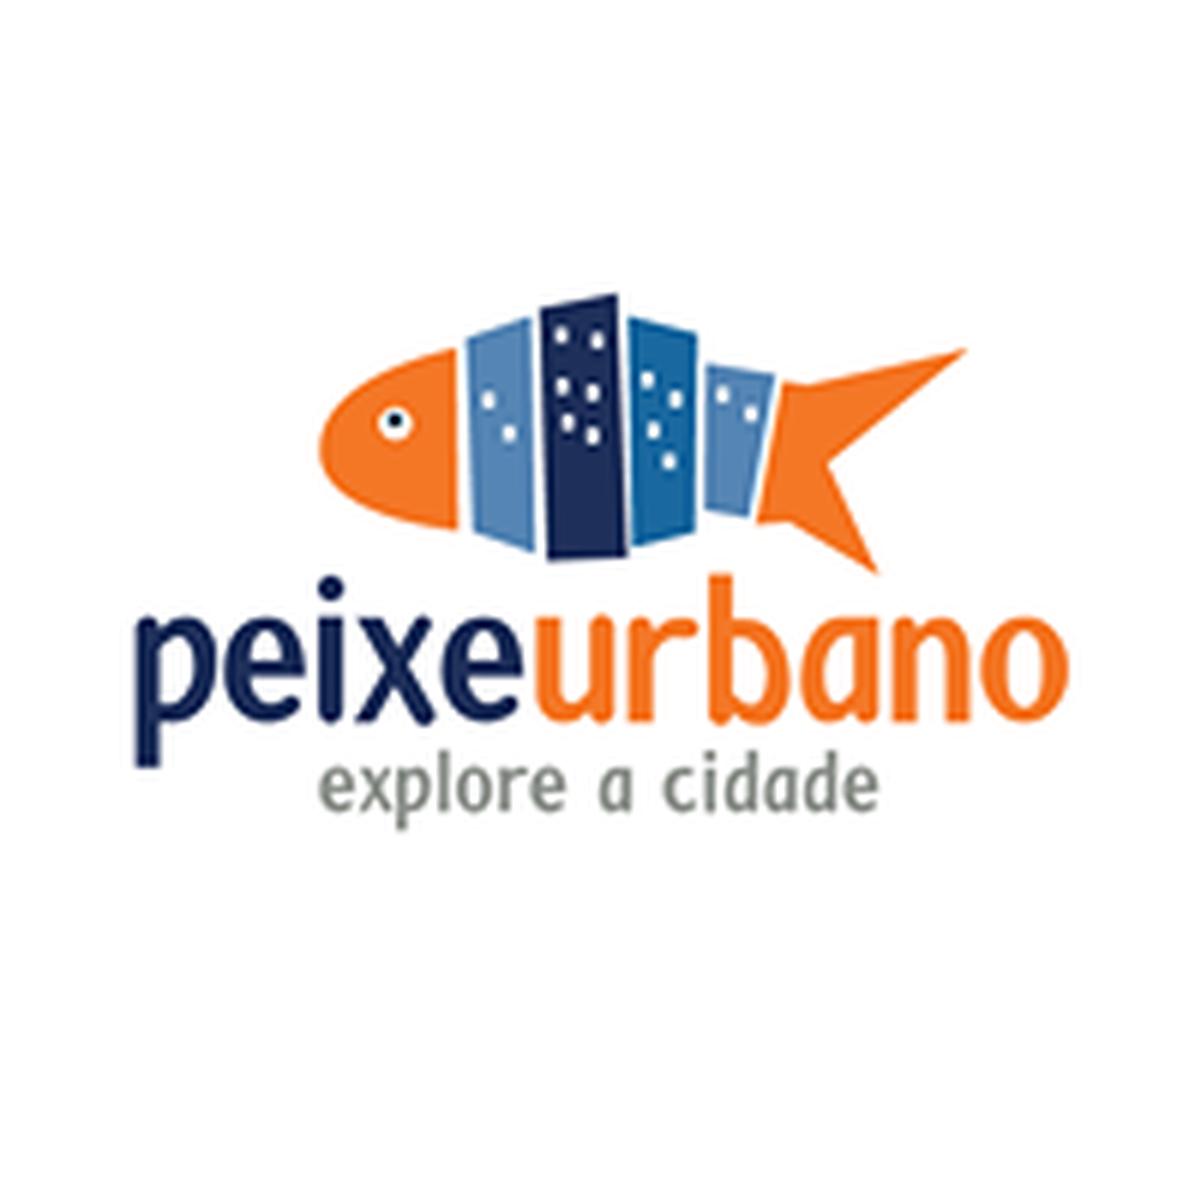 Peixe Urbano logo